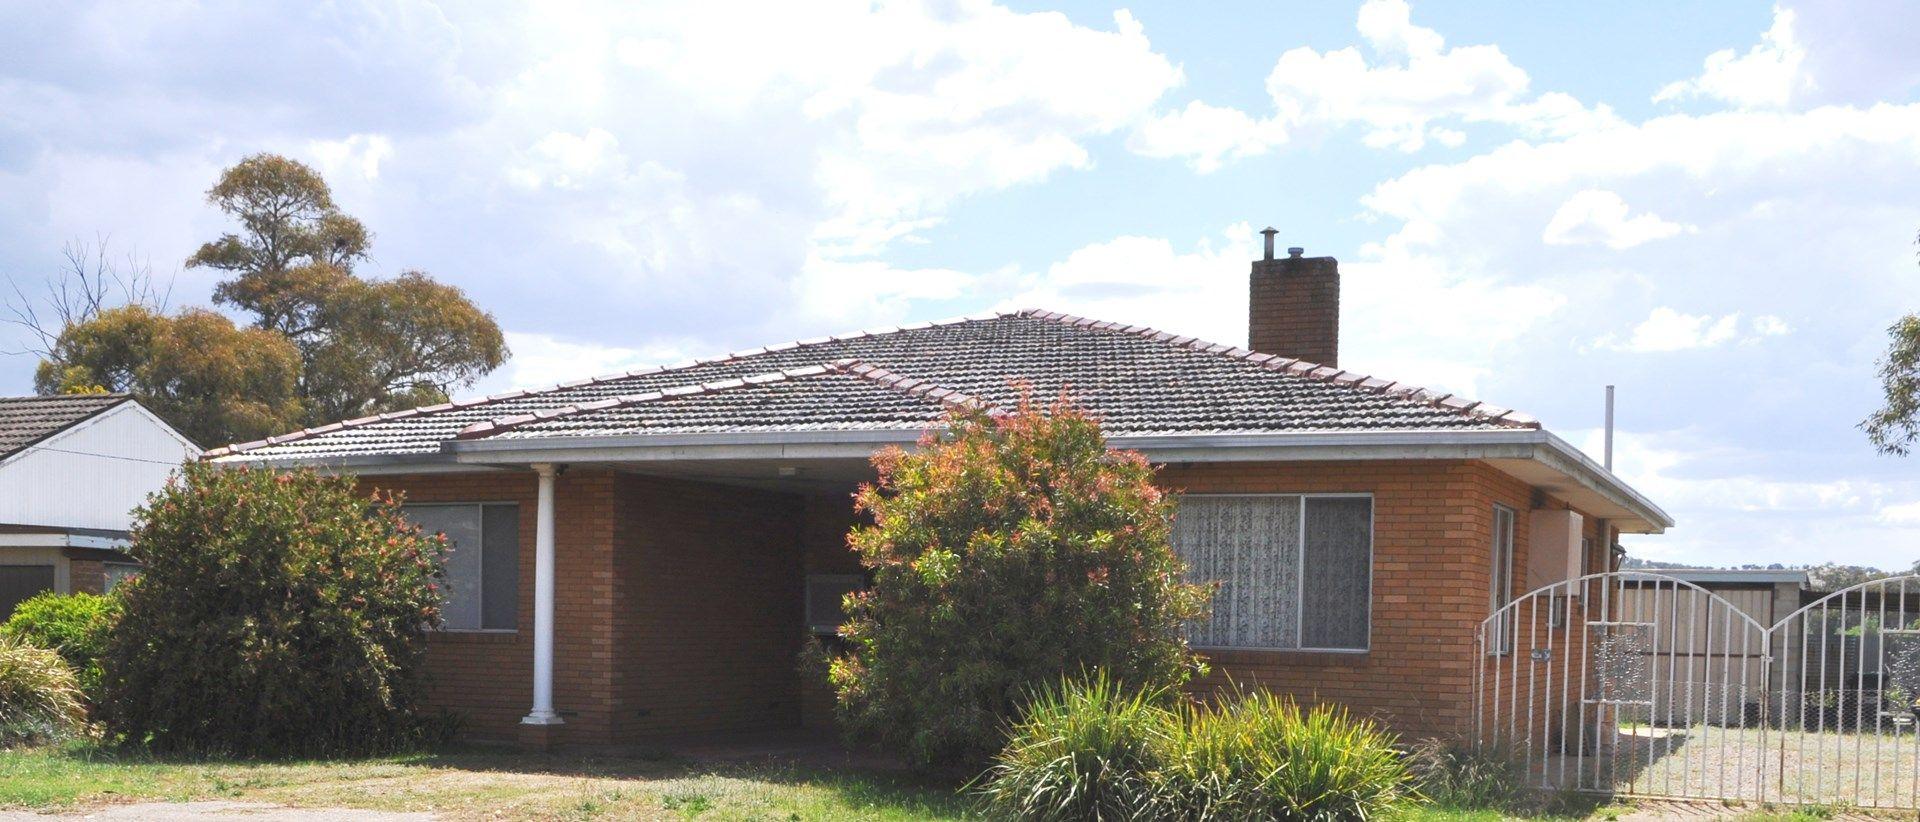 14 McKenna Avenue, Cootamundra NSW 2590, Image 0